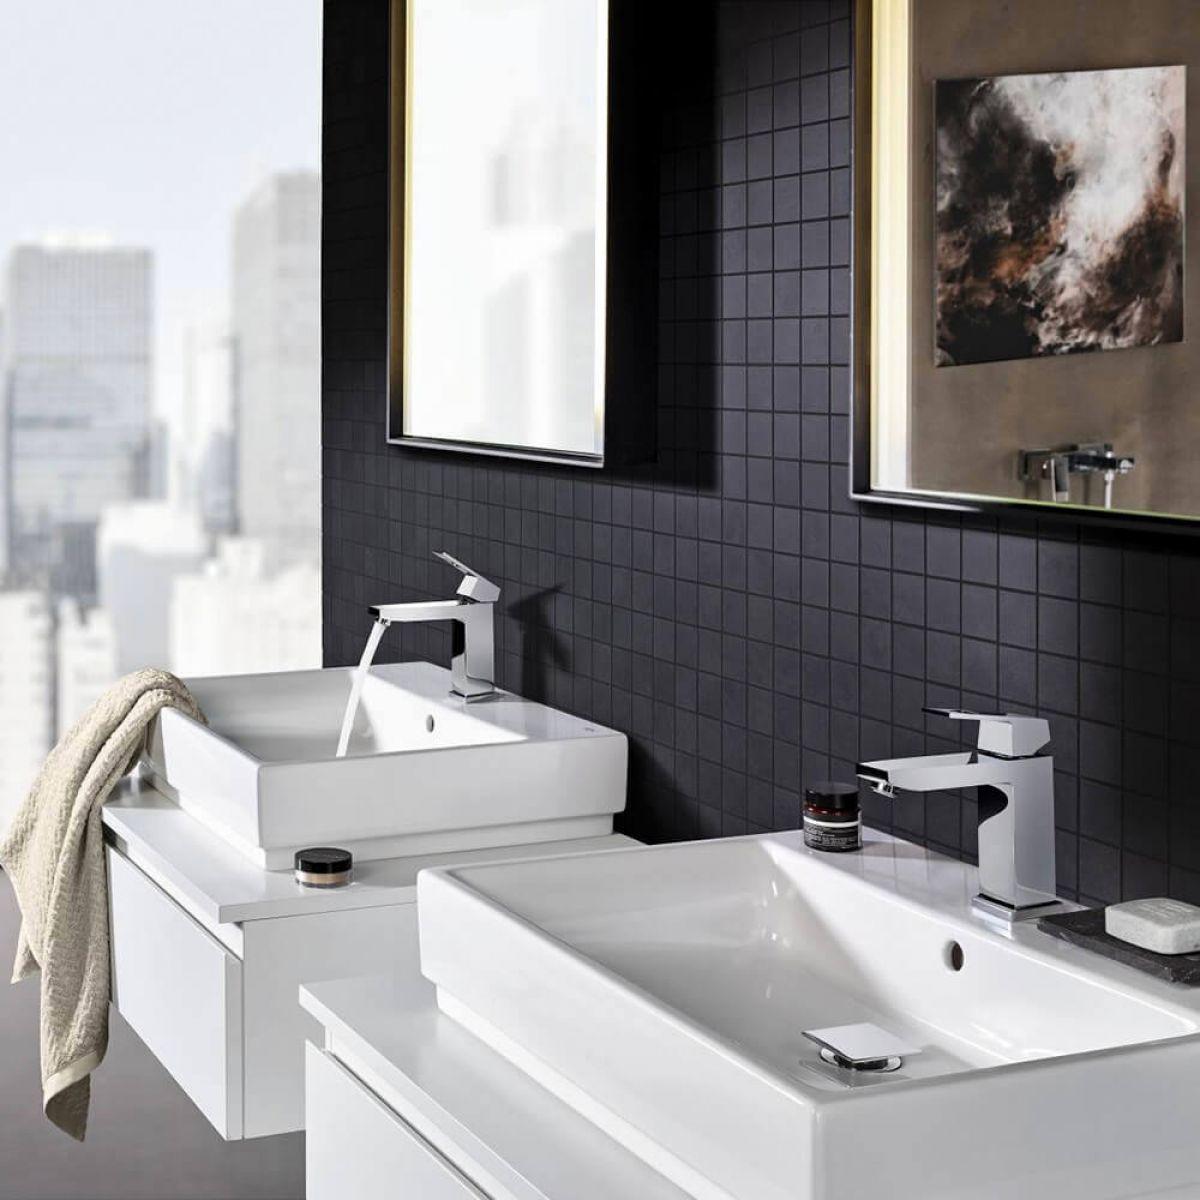 Grohe Cube Ceramic Countertop Washbasin - UK Bathrooms